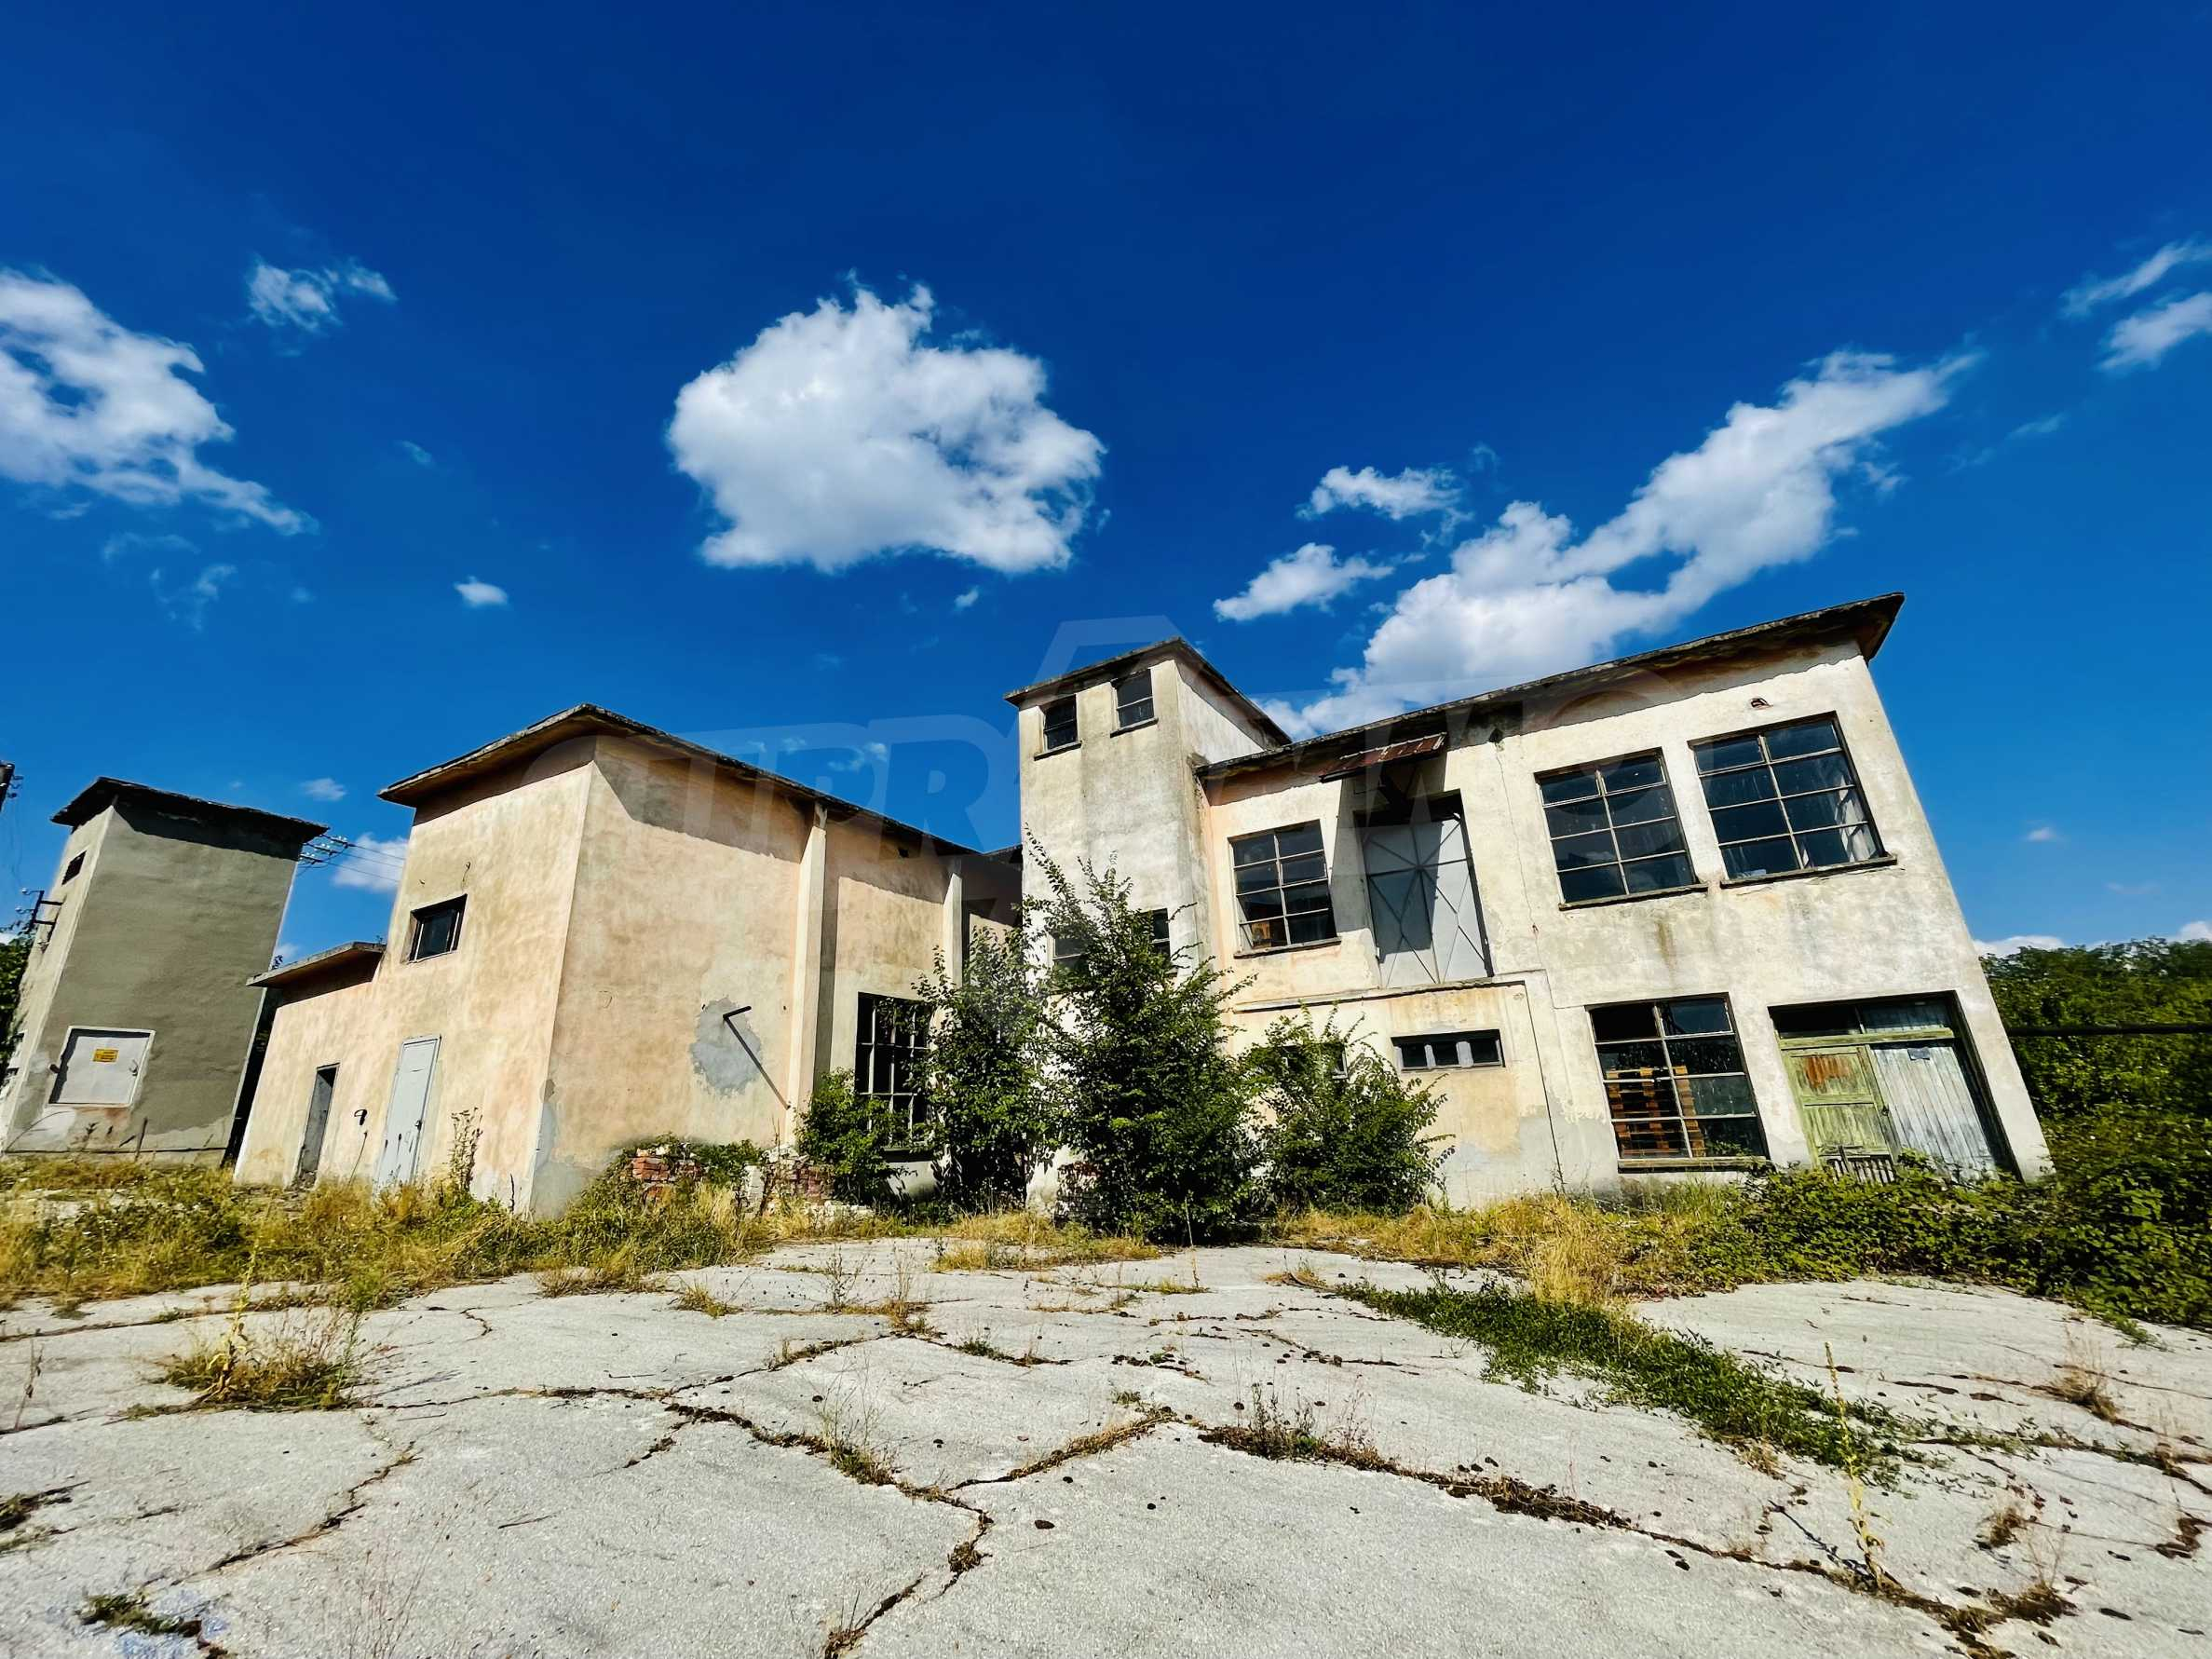 Fabrik in der Nähe von Veliko Tarnovo